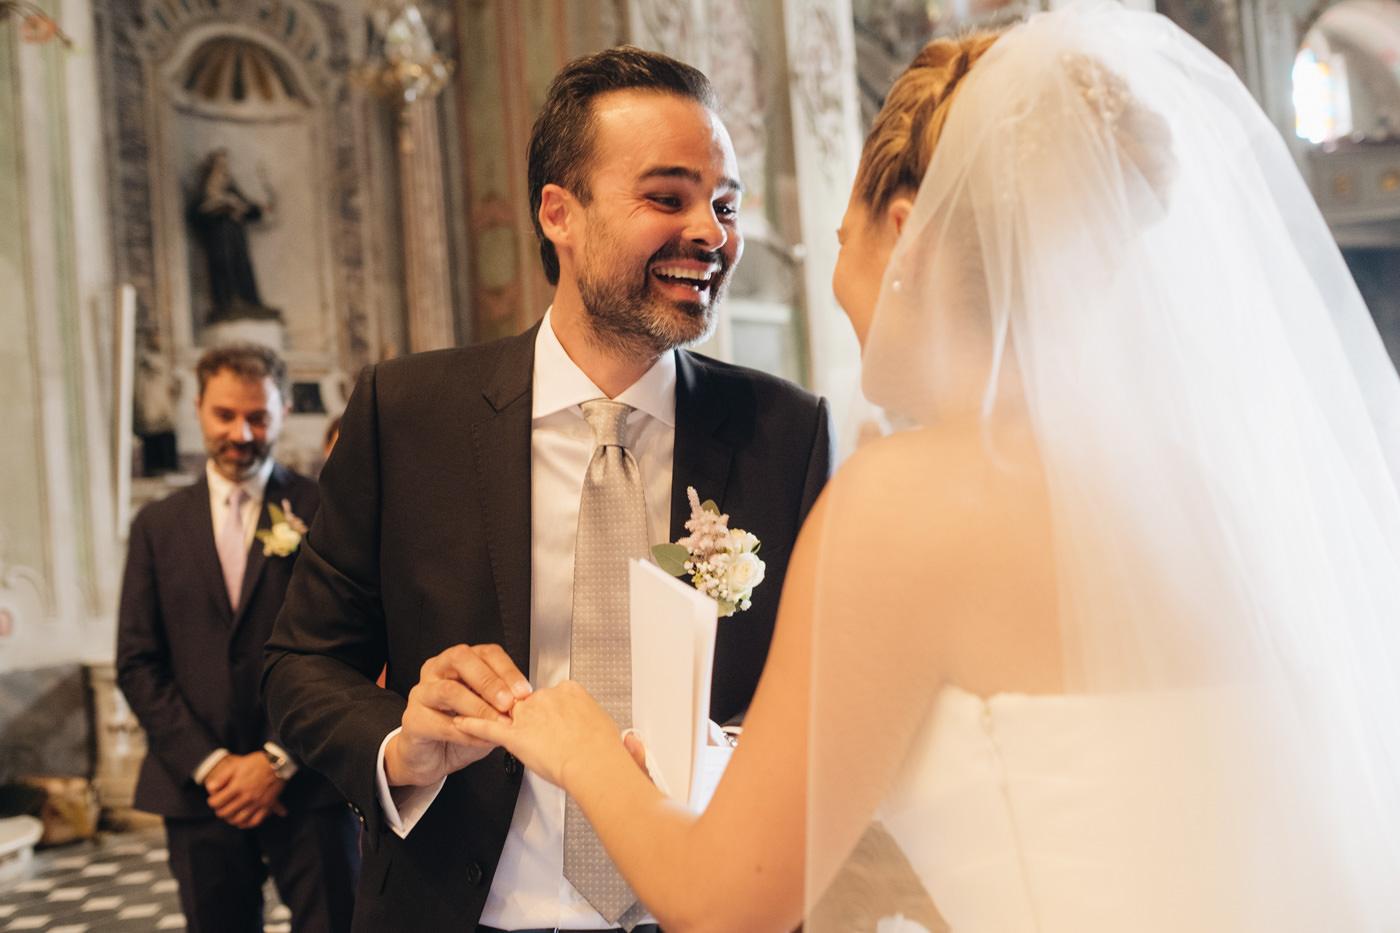 matrimoni_all_italiana_fotografo_matrimonio_cinque_terre-23.jpg